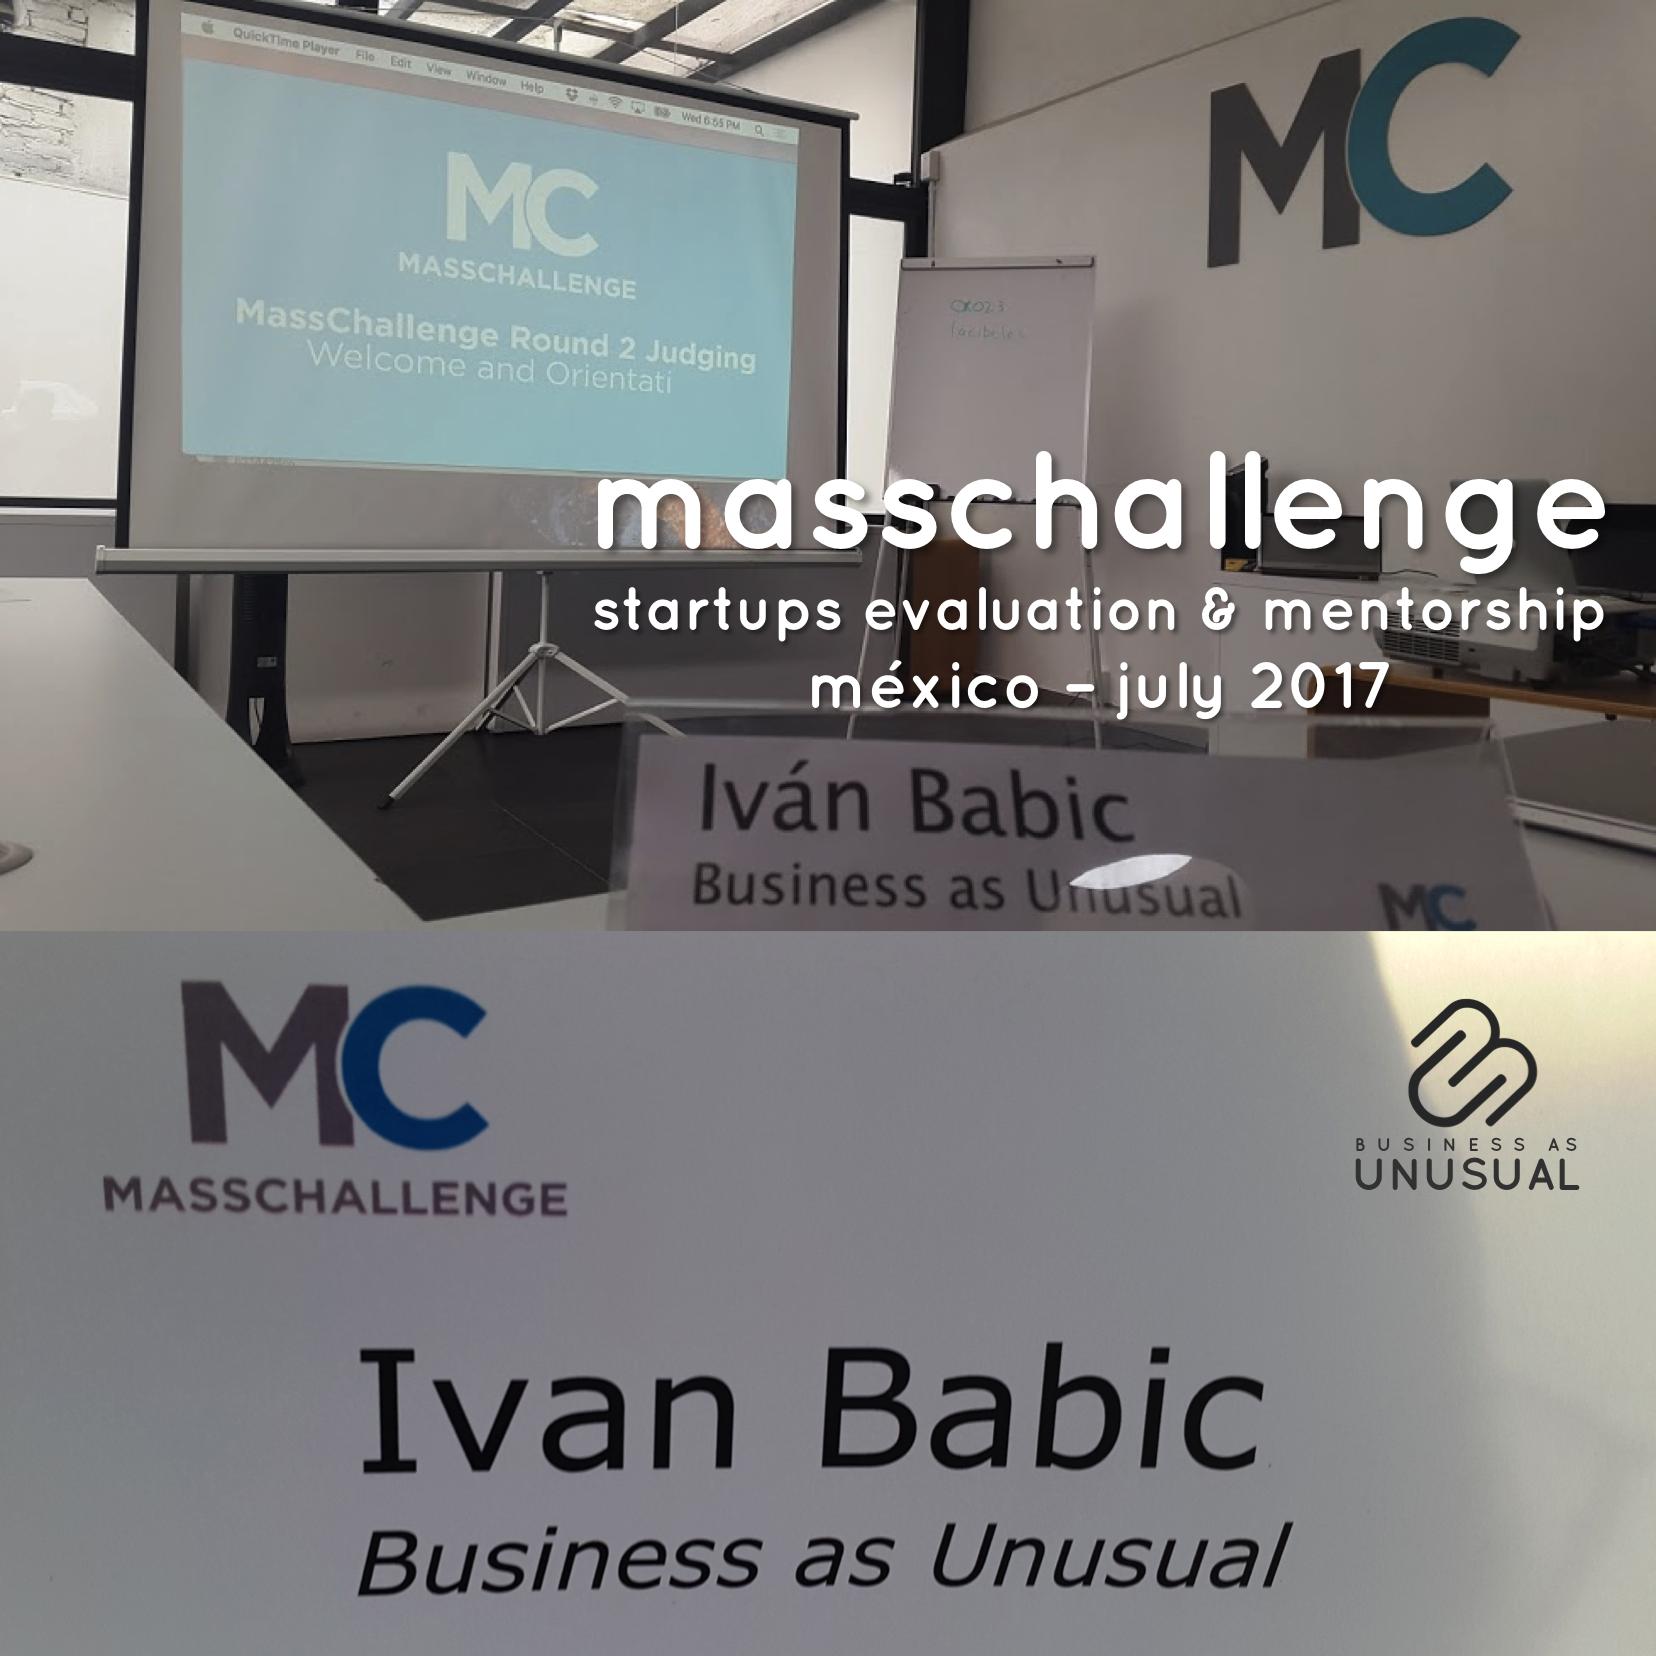 MassChallenge - Startups Evaluation & Mentorship